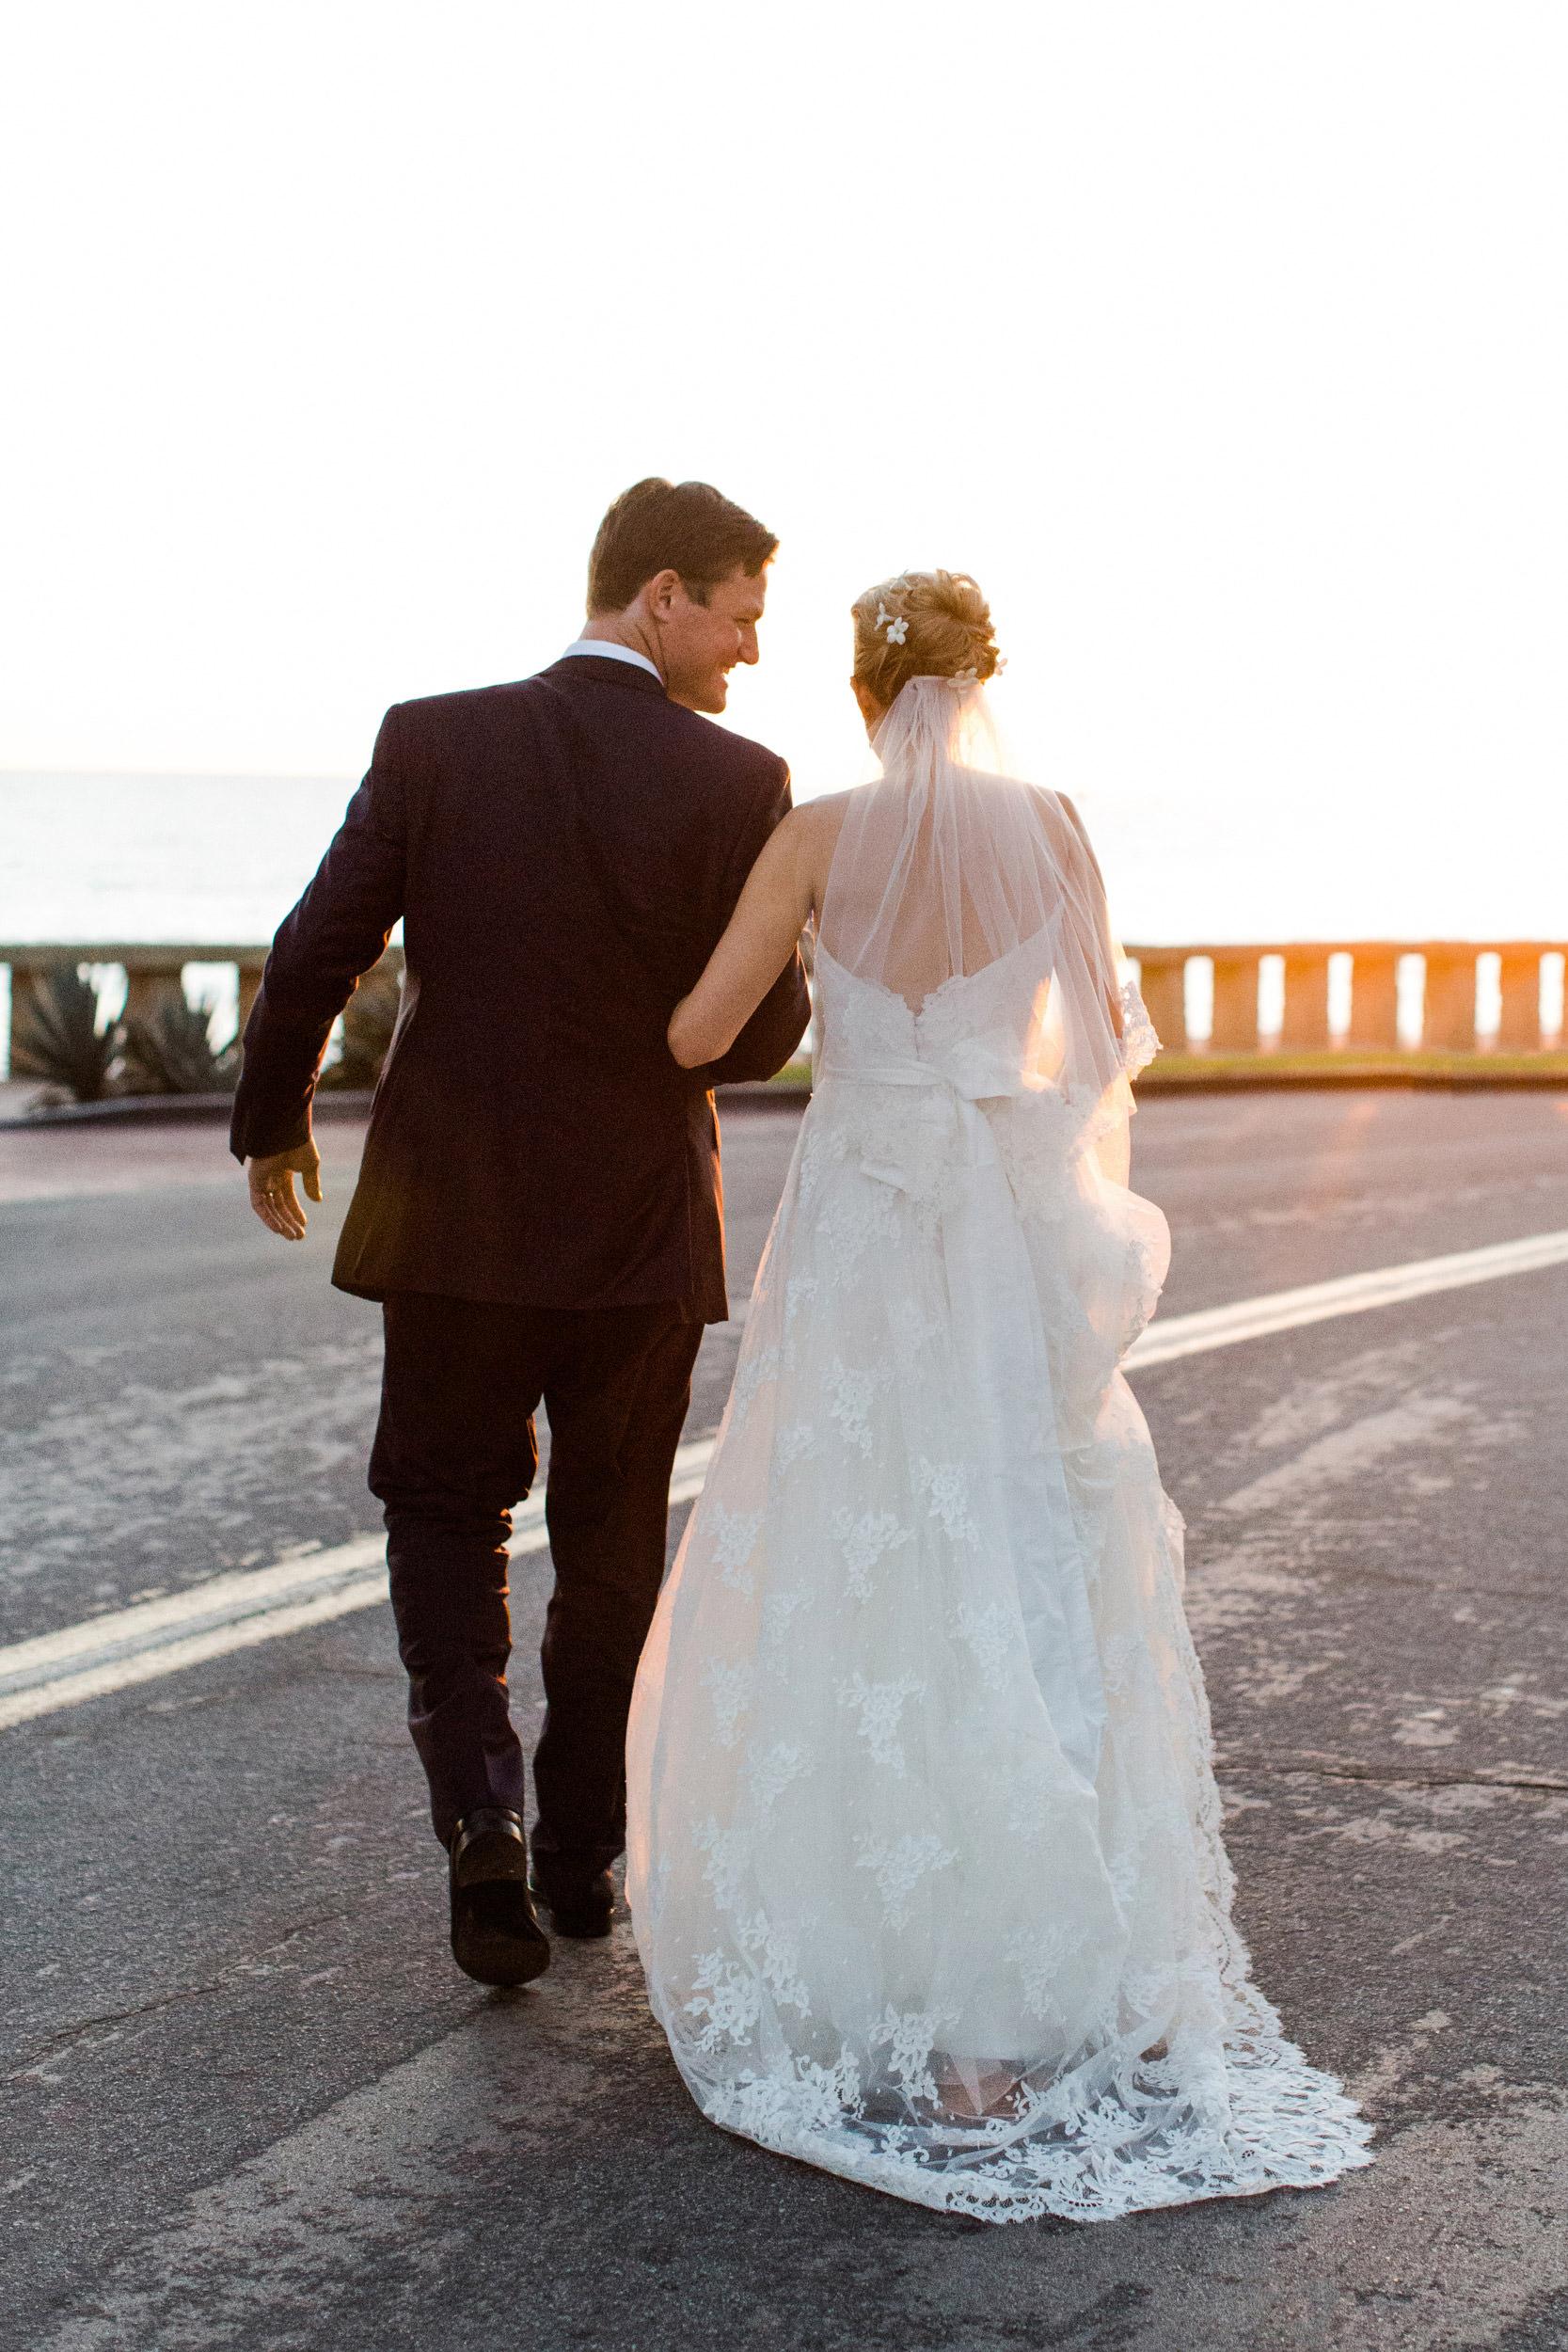 biltmore_santa_barbara_wedding_photos_coral_casino_034.jpg